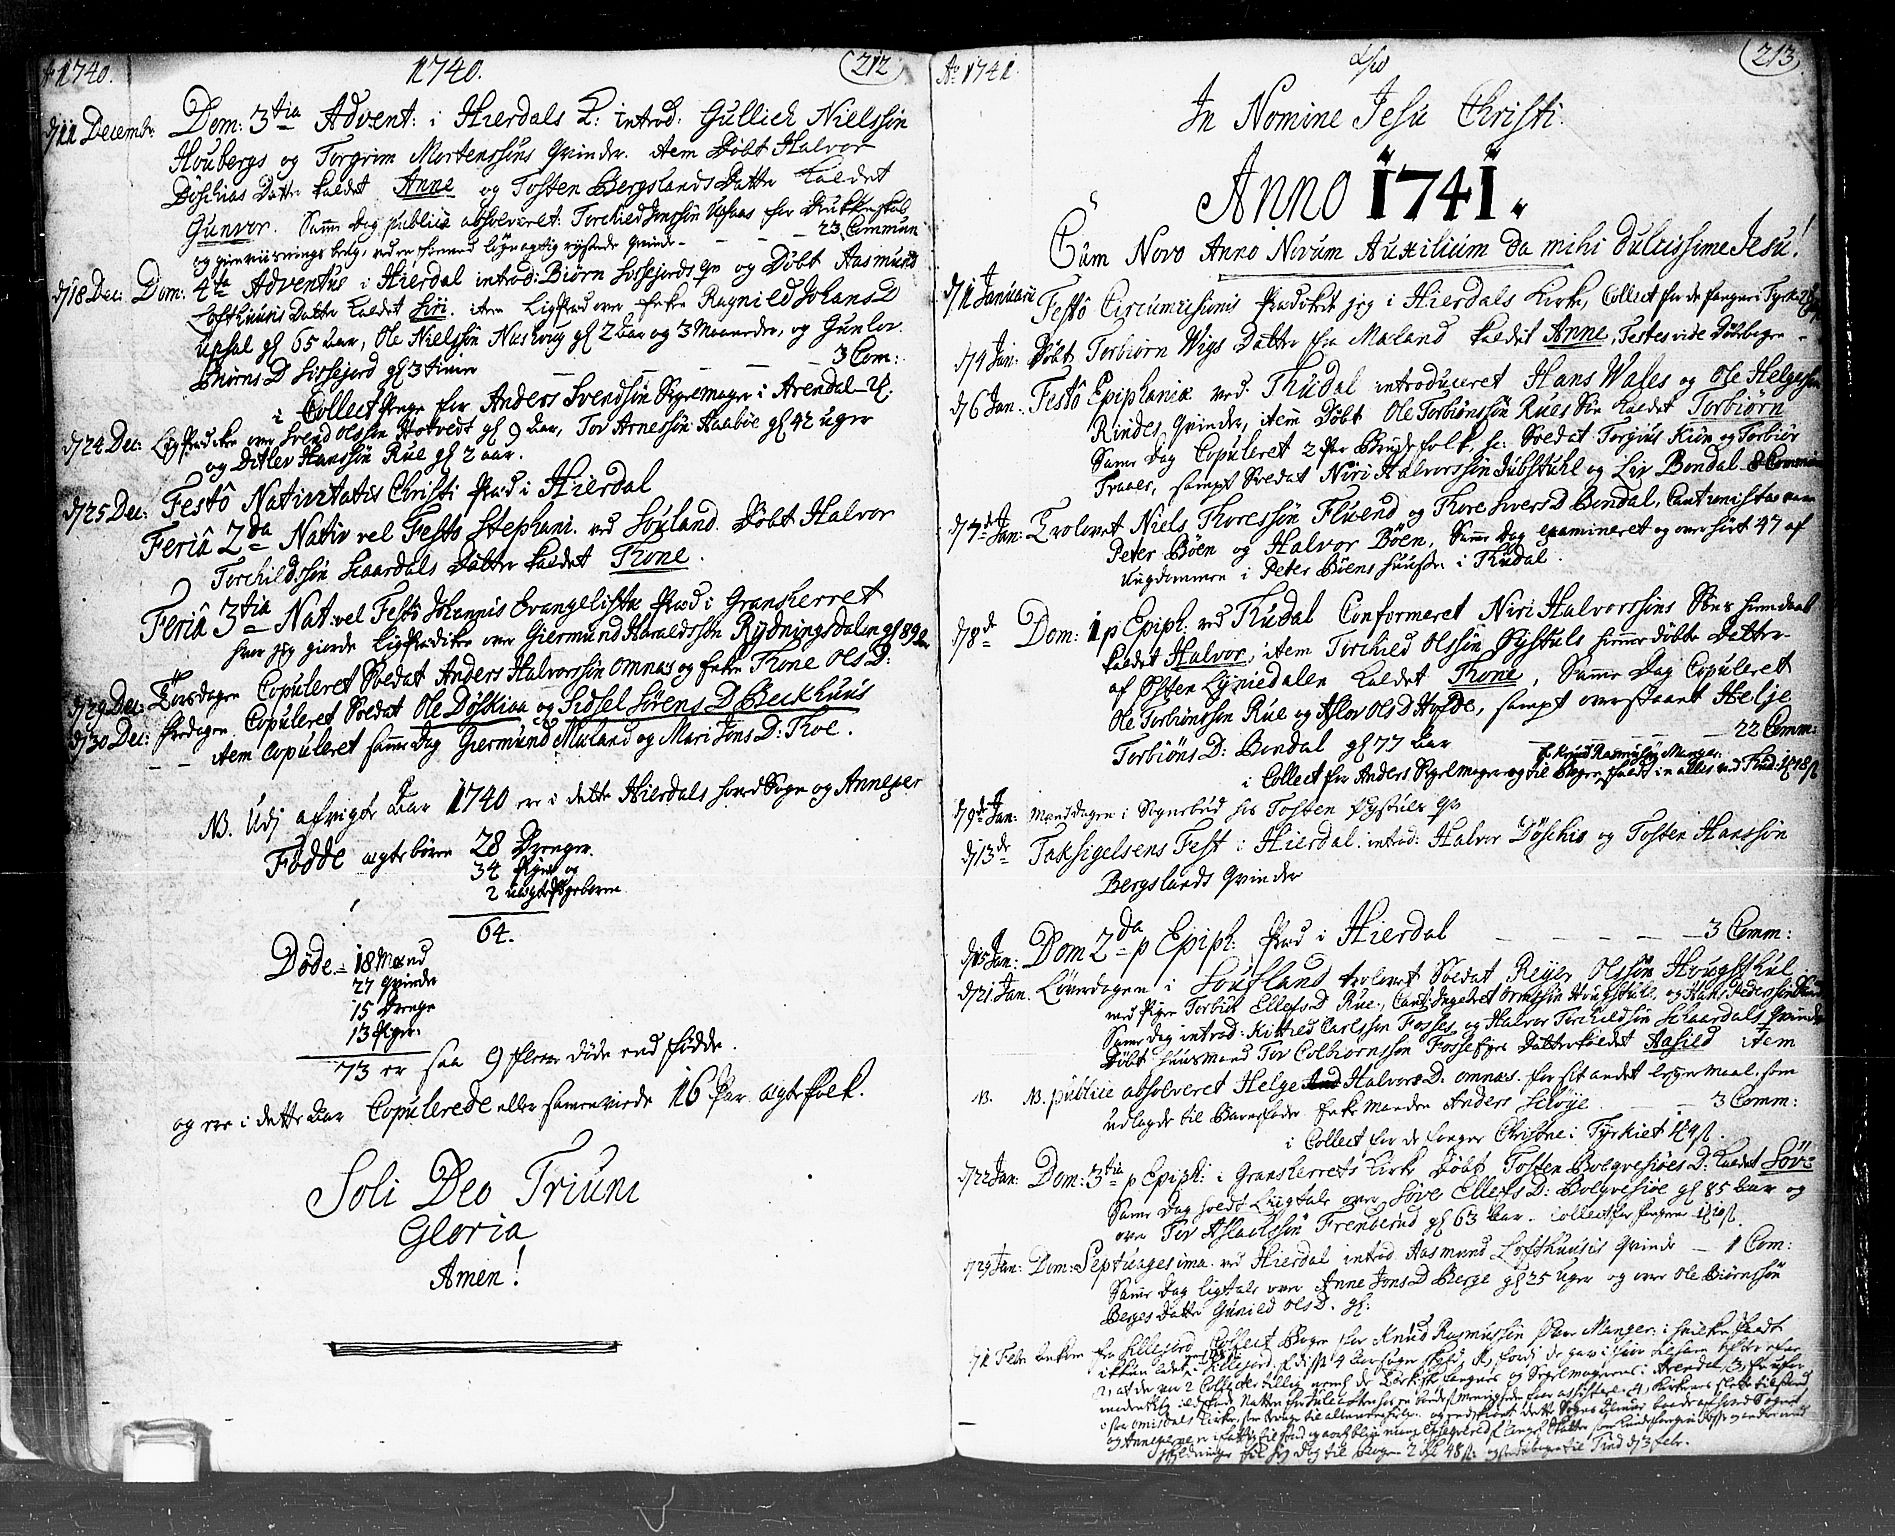 SAKO, Hjartdal kirkebøker, F/Fa/L0002: Ministerialbok nr. I 2, 1716-1754, s. 212-213